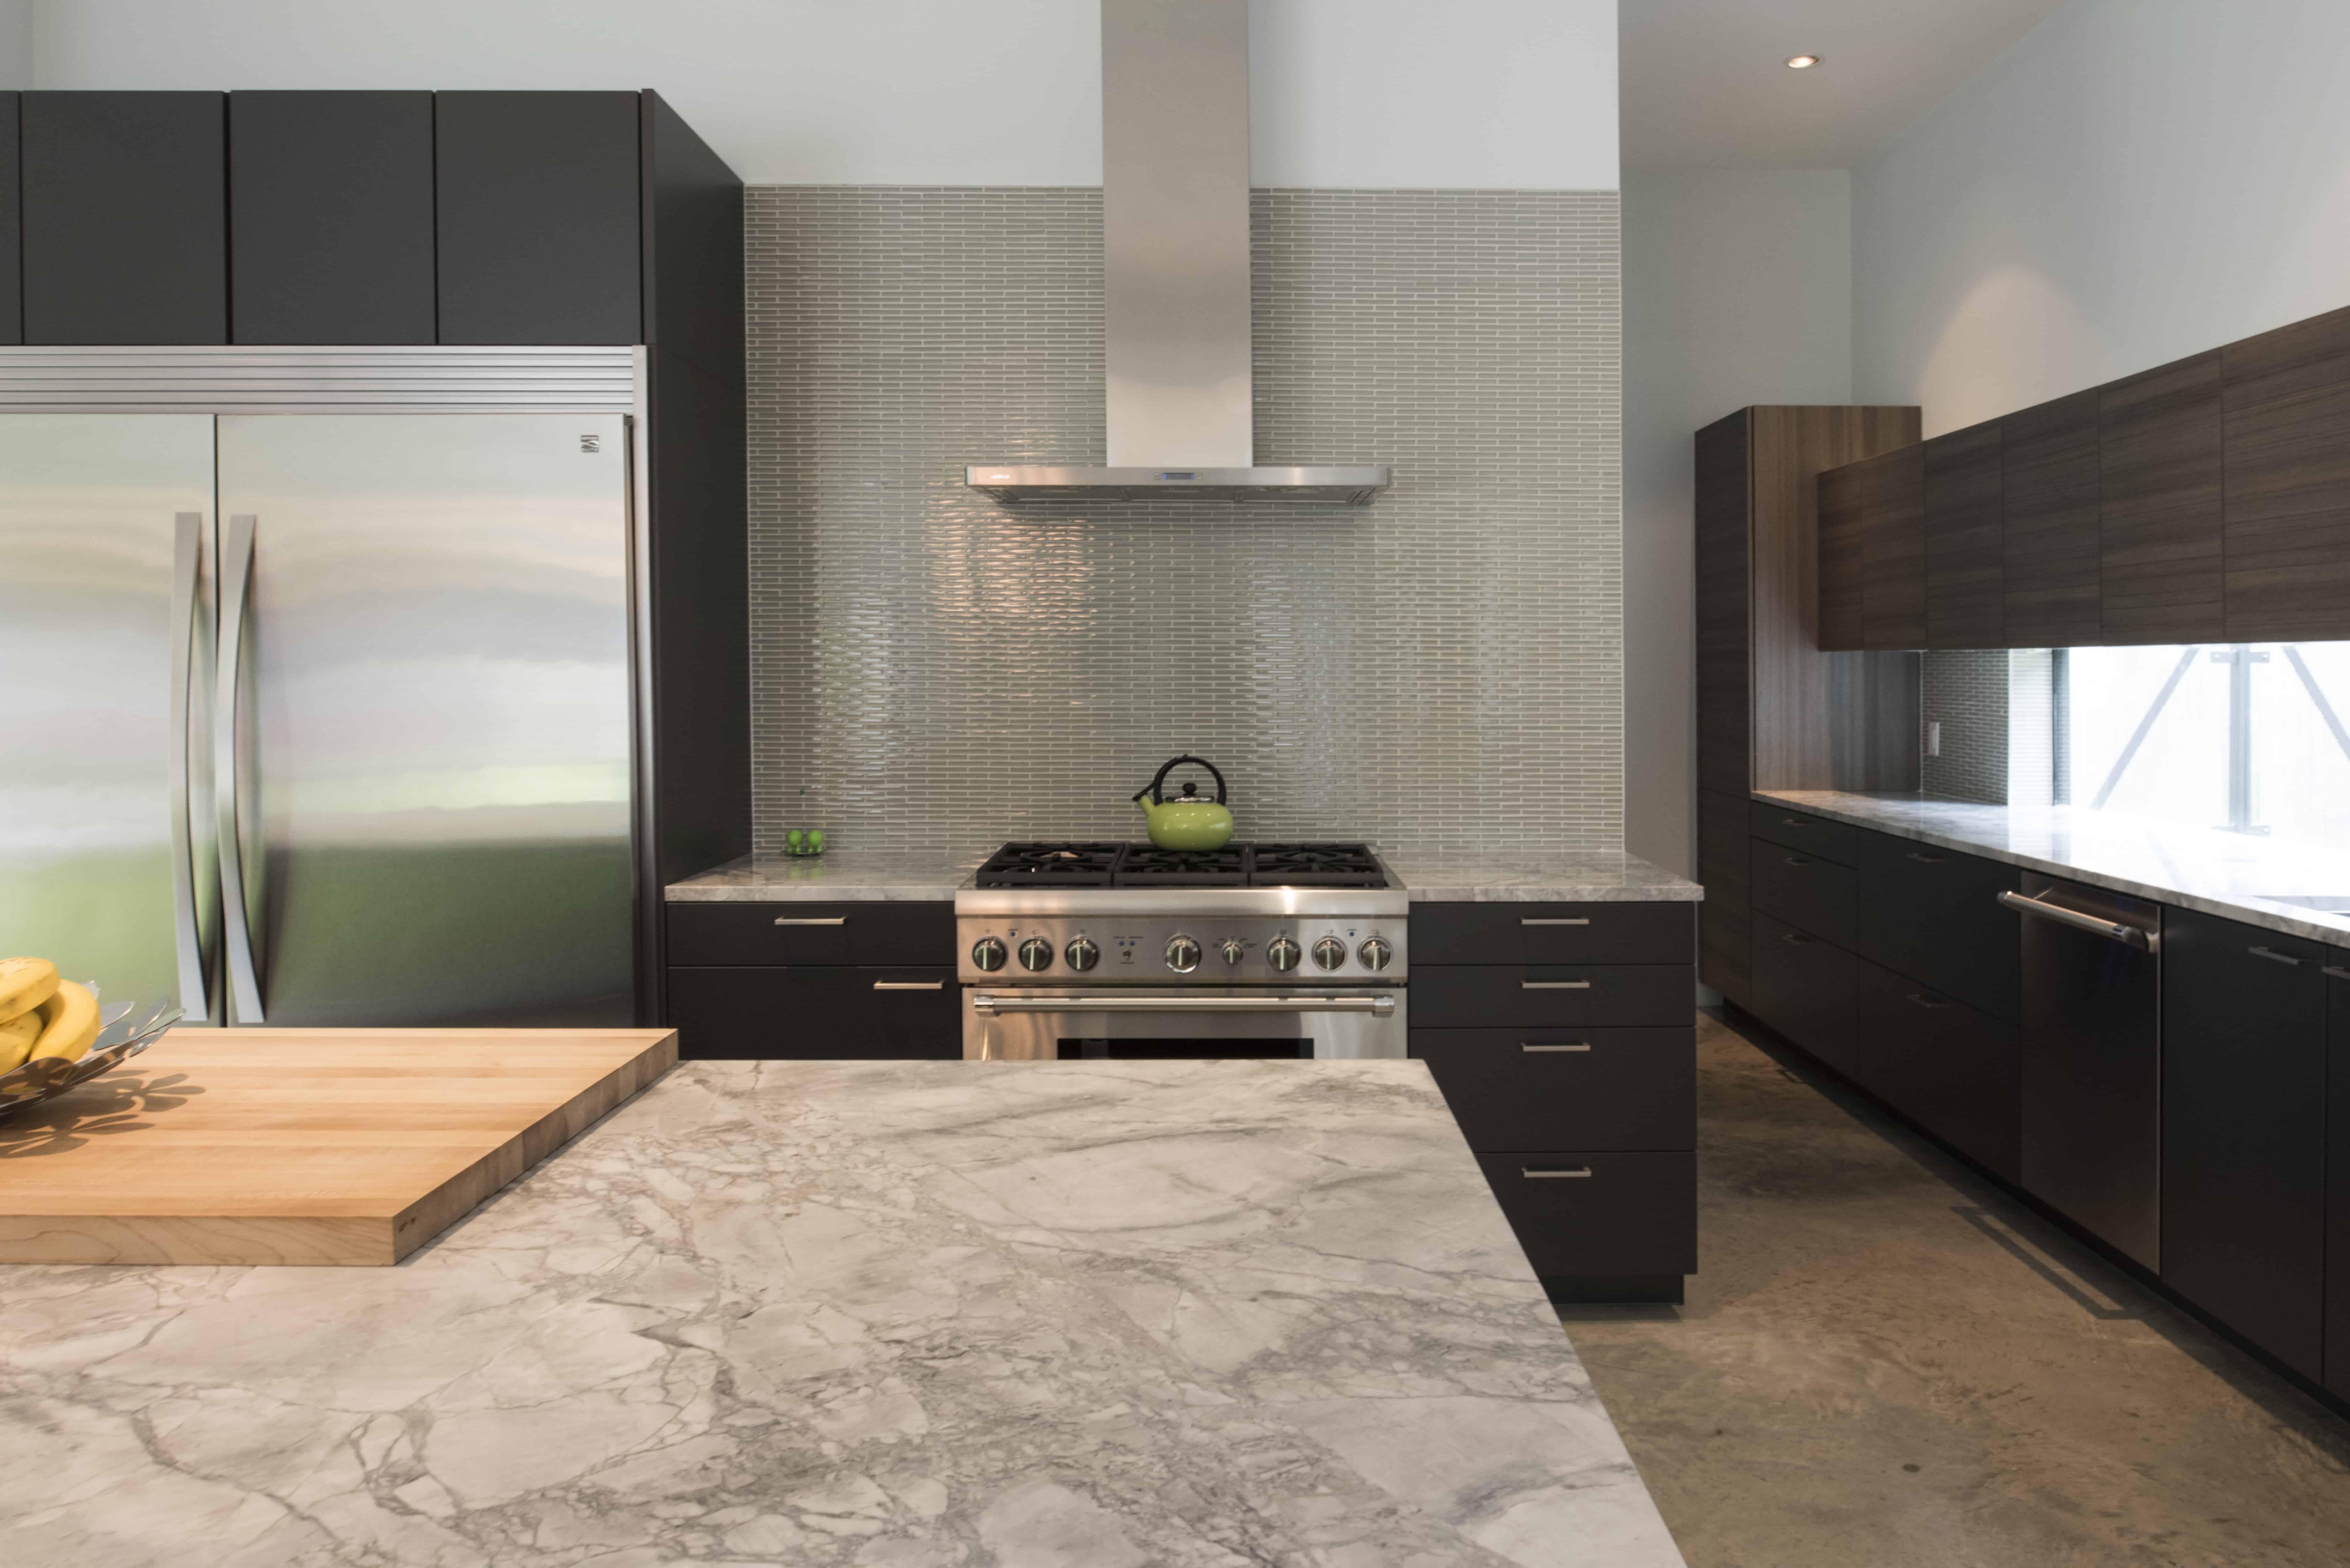 Garden Oaks Modern kitchen